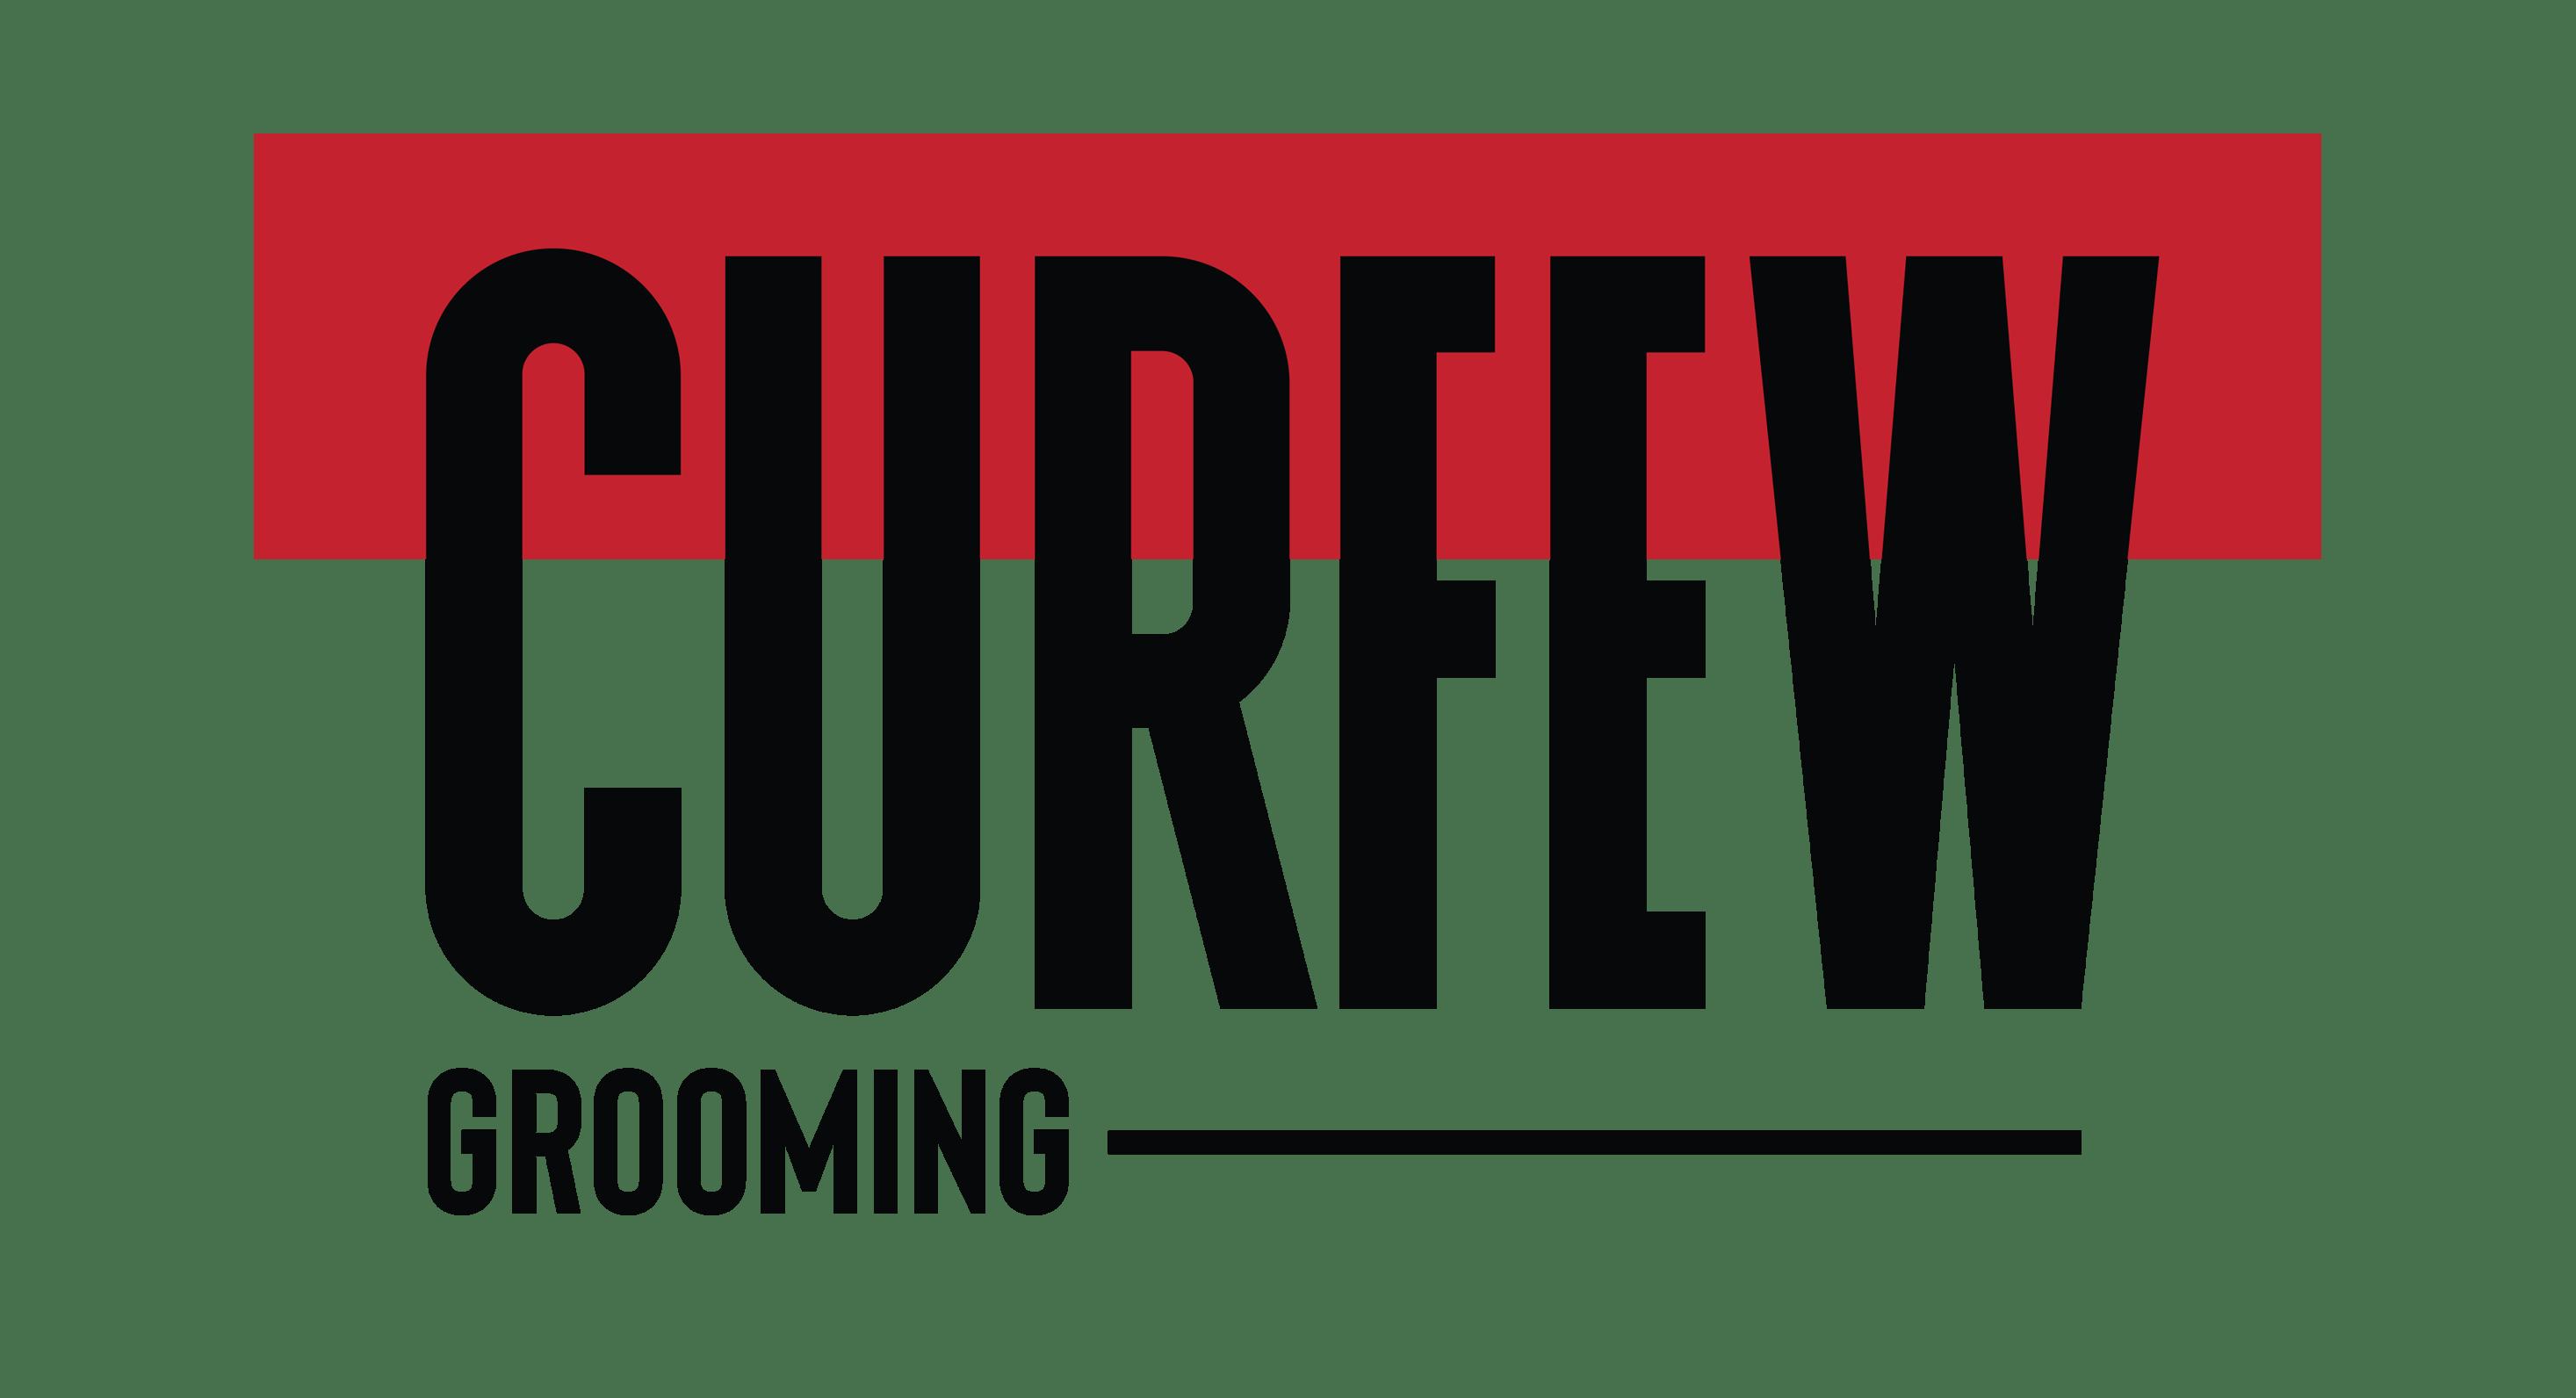 Curfew Grooming logo